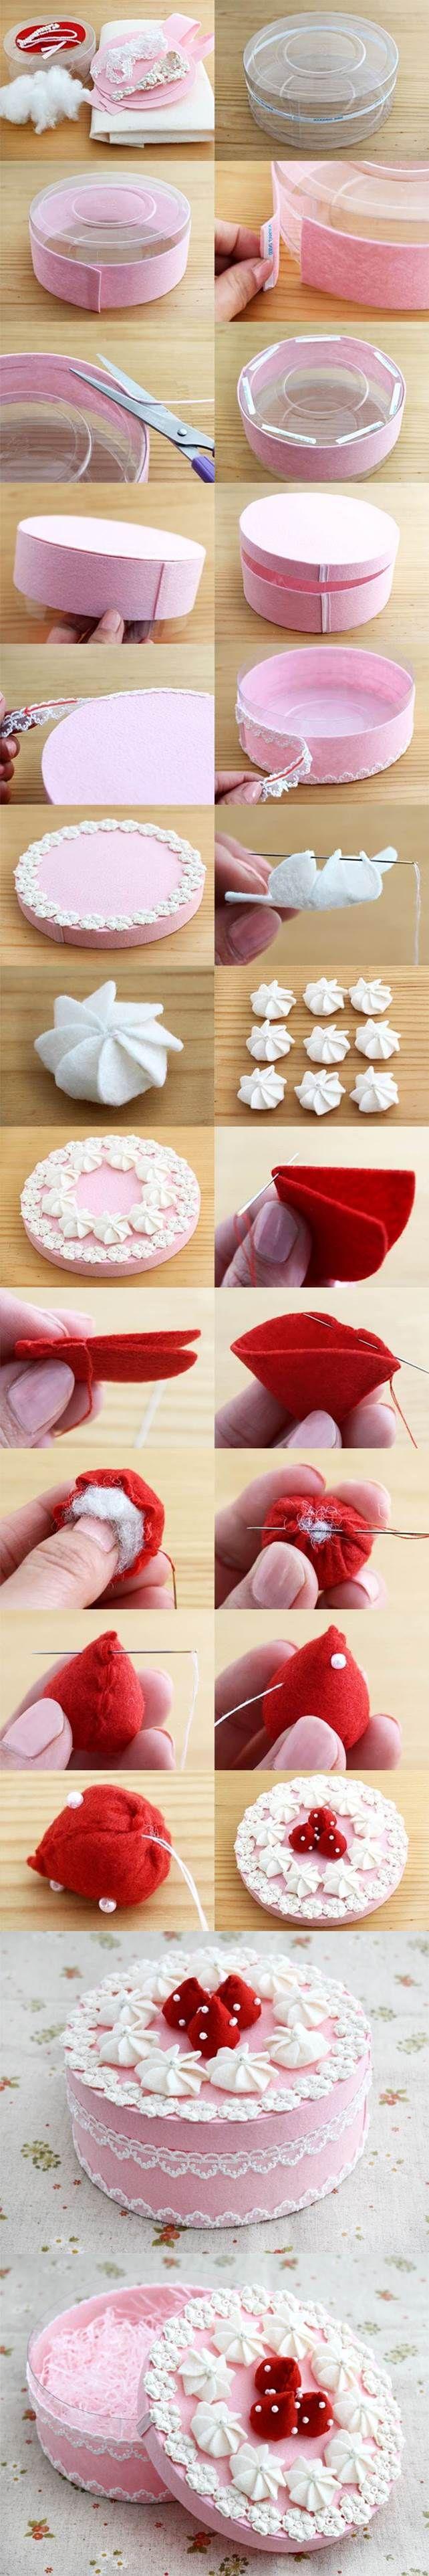 DIY Beautiful Gift Box Decorated Like a Cake | iCreativeIdeas.com Like Us on Fac...